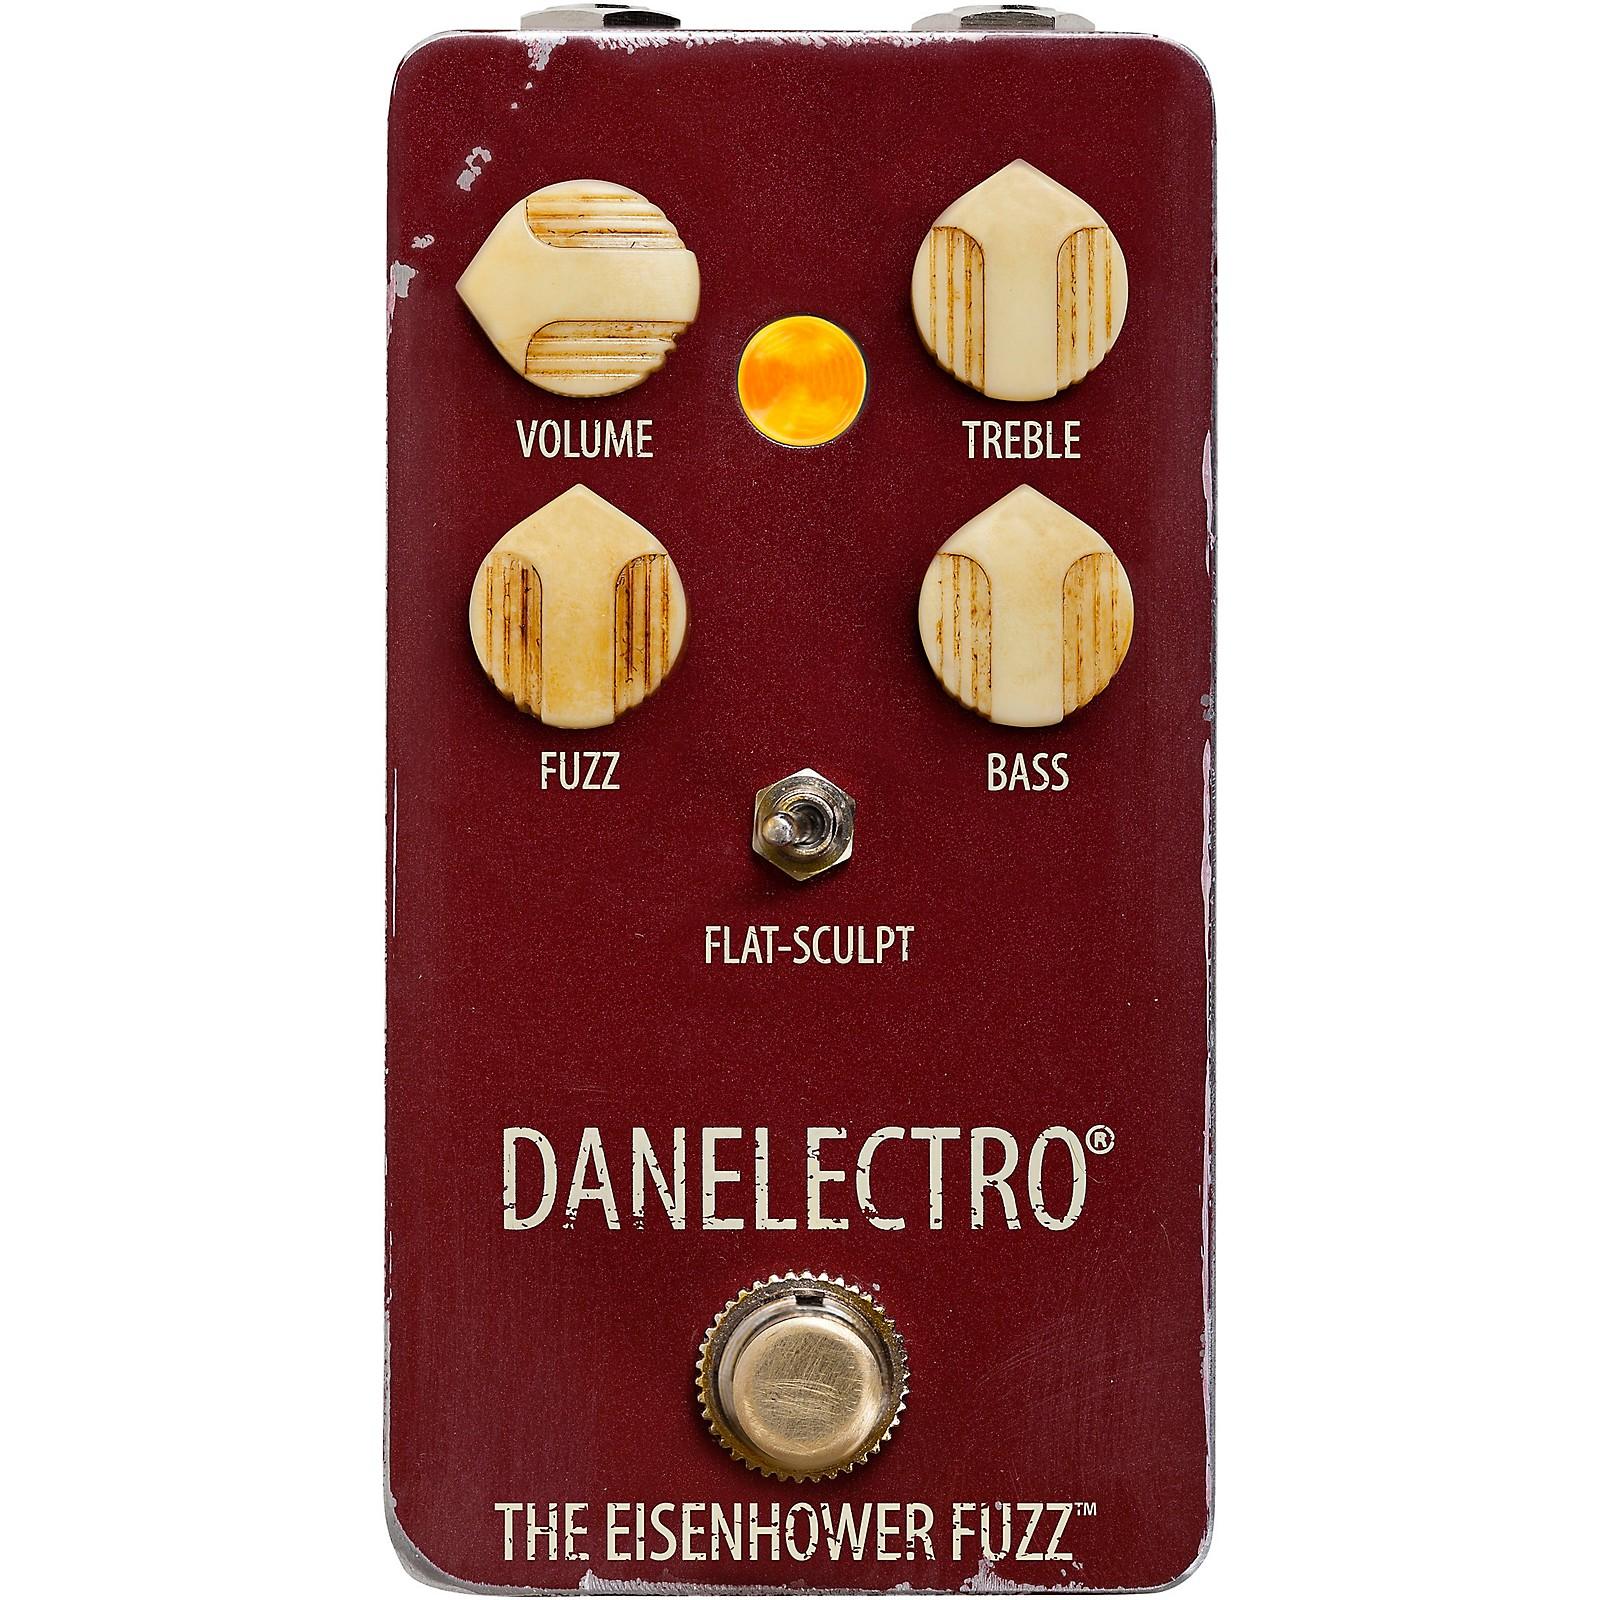 Danelectro The Eisenhower Fuzz Effects Pedal